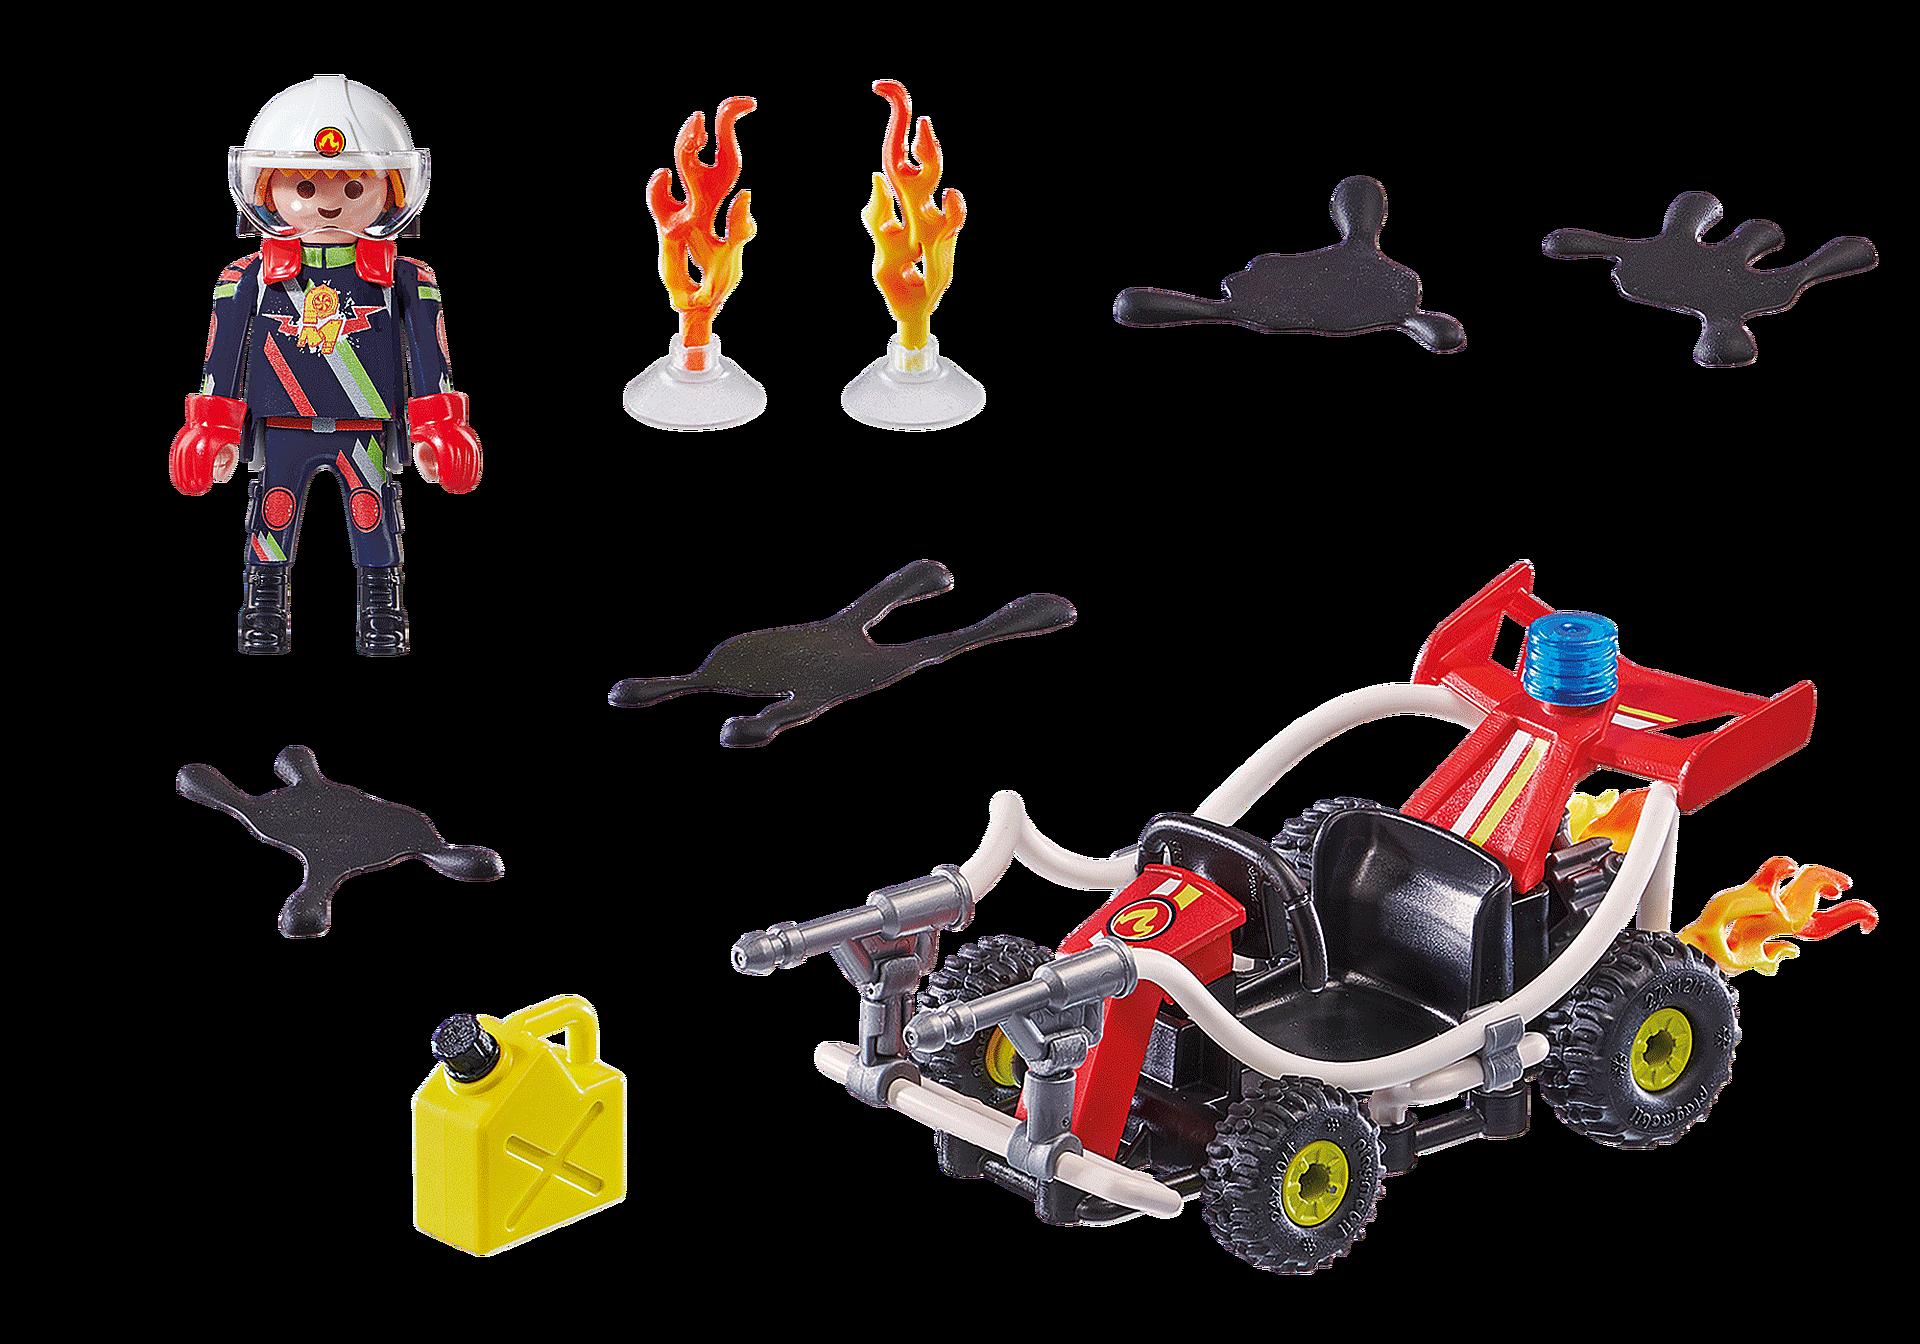 70554 Stunt Show Fire Quad zoom image3